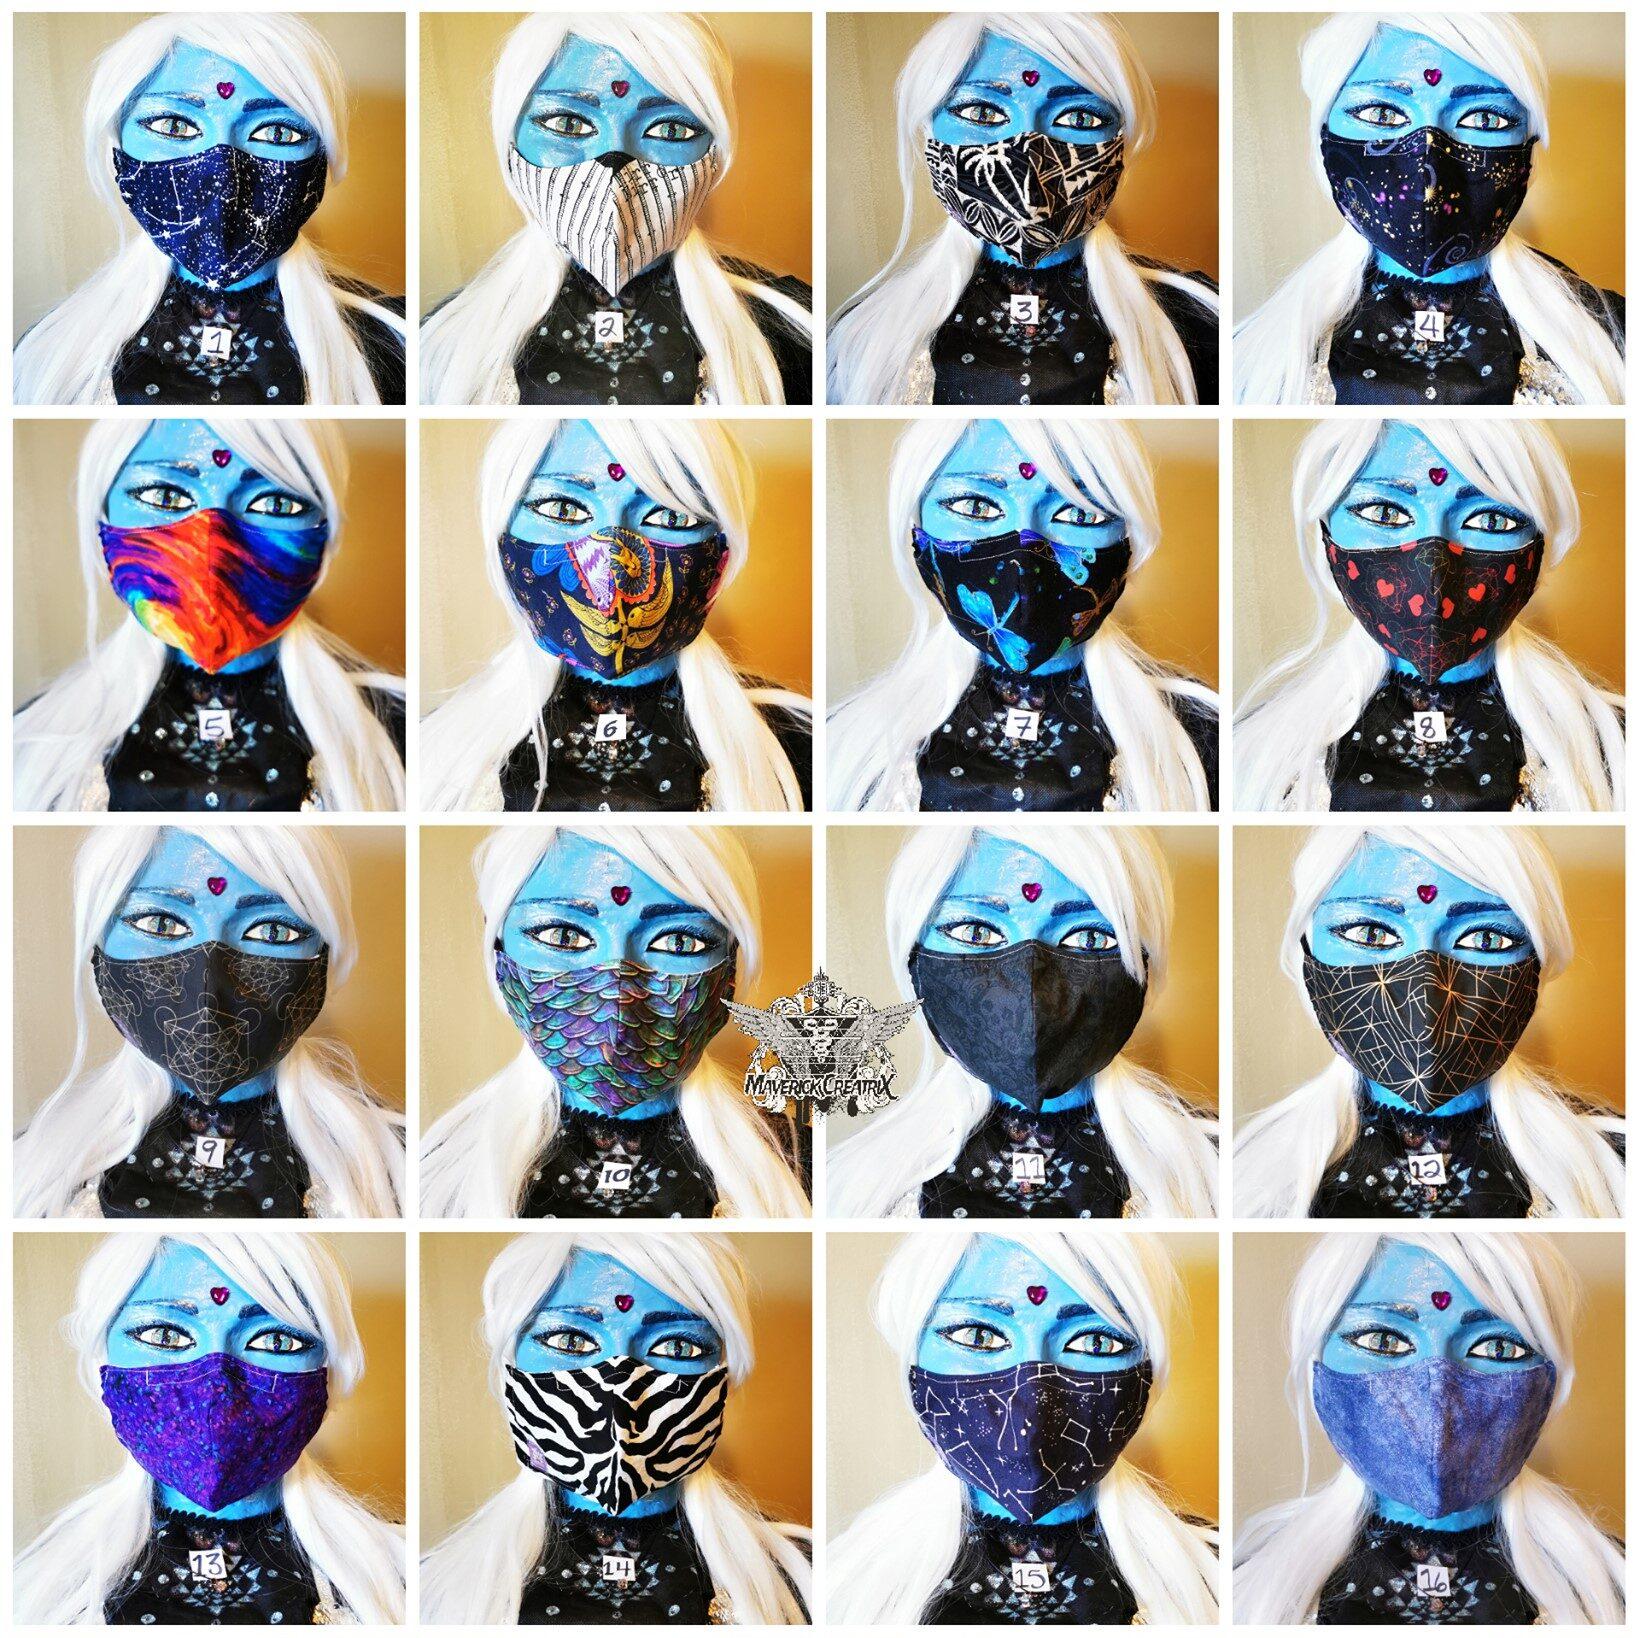 MCX Masks